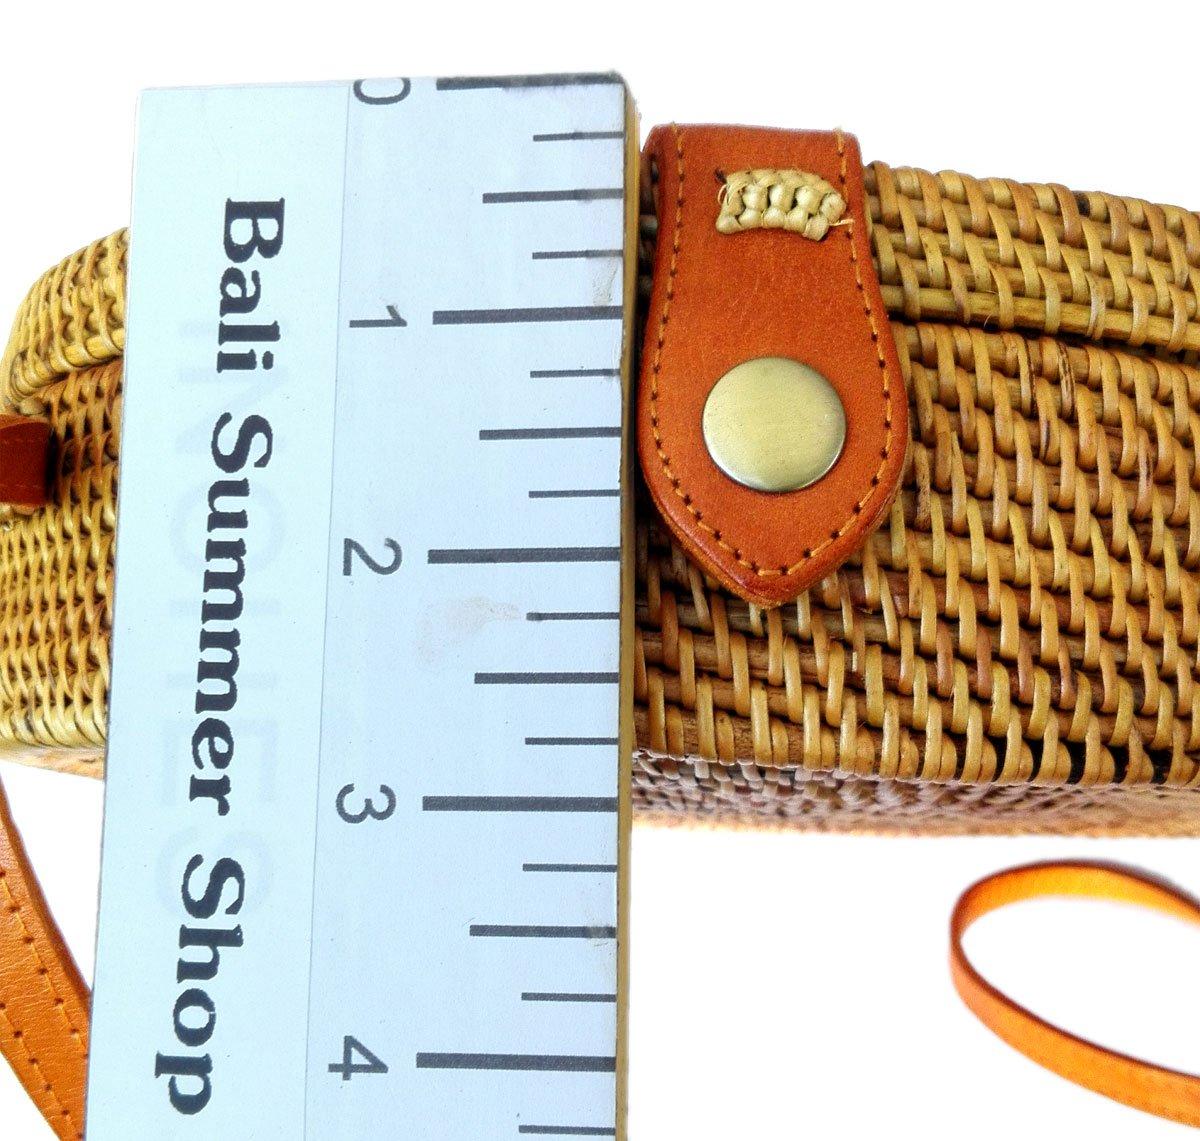 Bali Rattan - Handwoven Round Rattan Bag (Plain Weave Leather Closure) by Bali Rattan (Image #4)